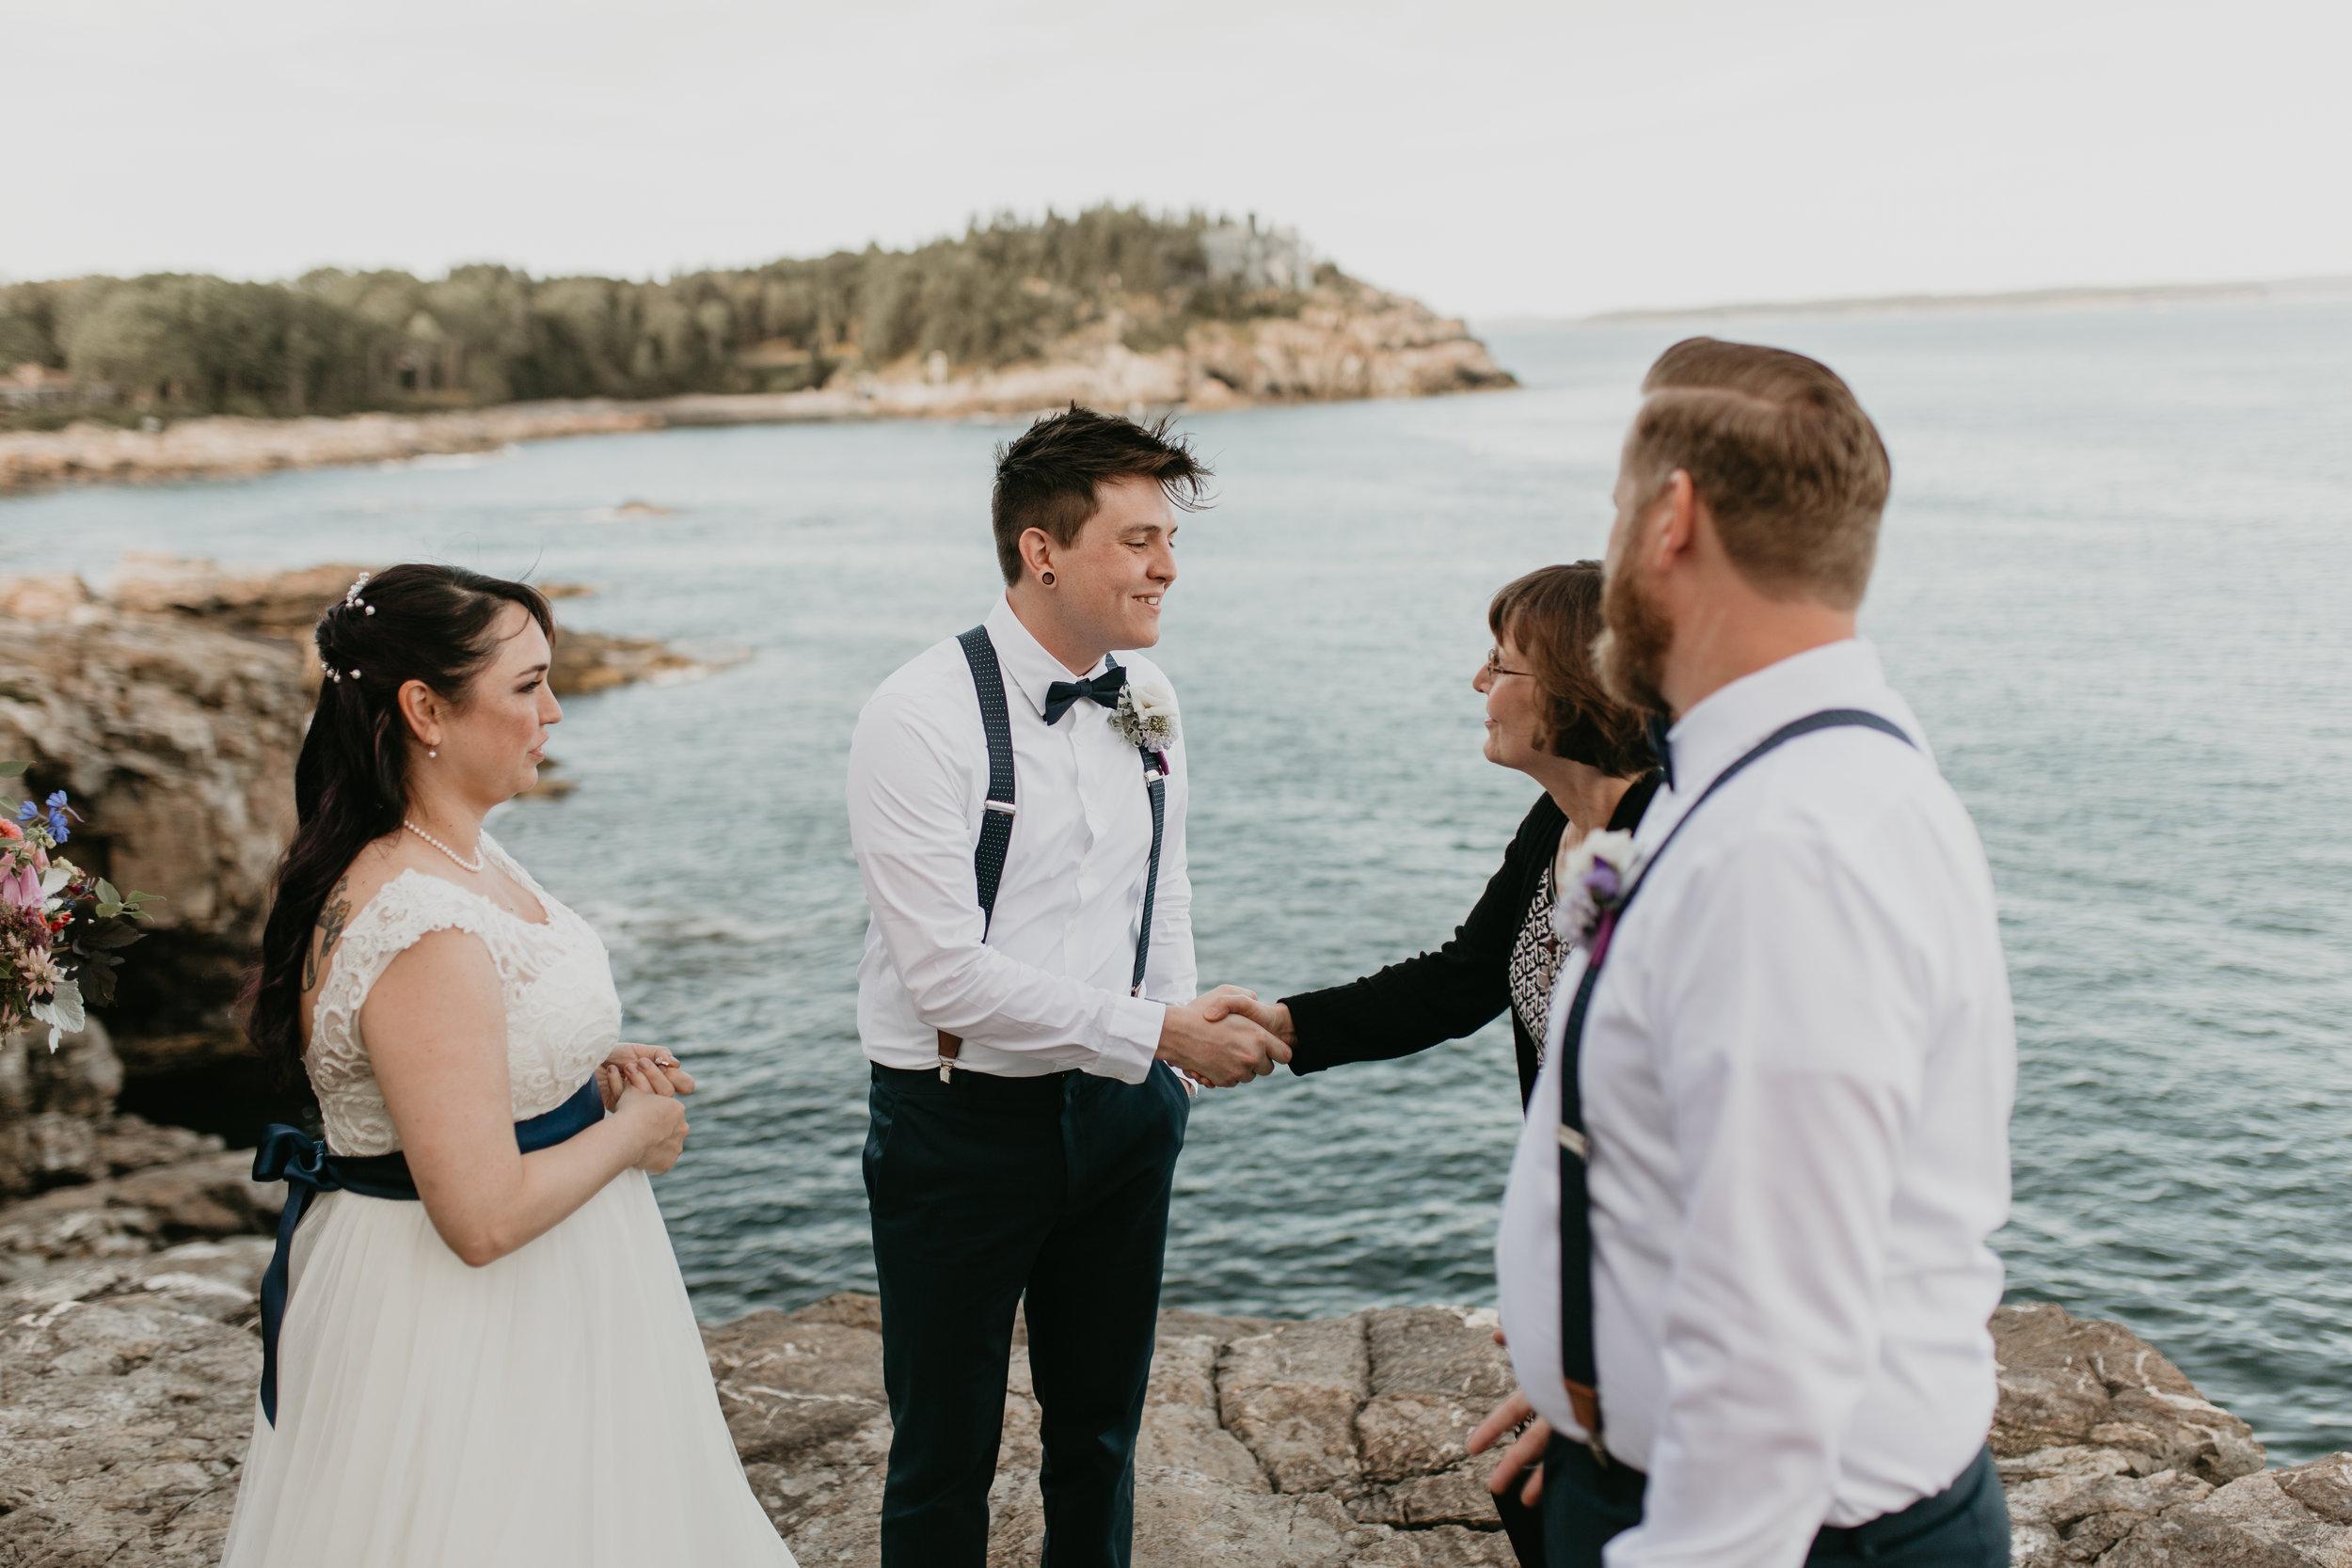 nicole-daacke-photography-Elopement-rocky-shoreline-coast-Acadia-National-Park-elopement-photographer-inspiration-maine-elopement-otter-cliffs-schoonic-head-point-27.jpg